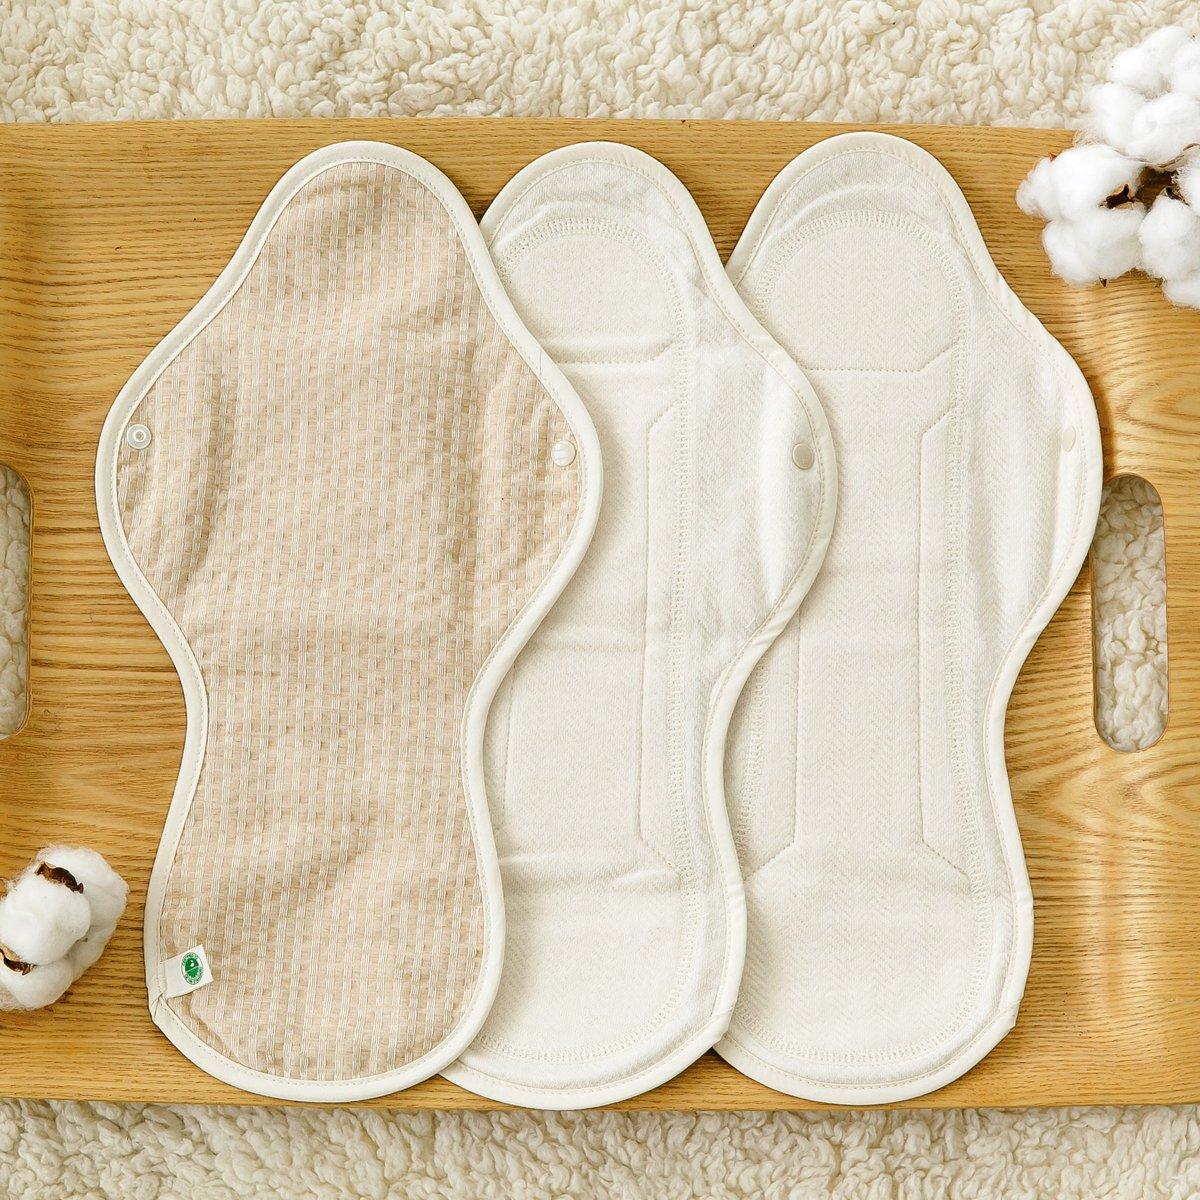 THINKECO [5 Pads] Organic-Hanji Reusable Menstrual Cotton Pads, Sanitary Napkins (XL) by THINKECO (Image #3)